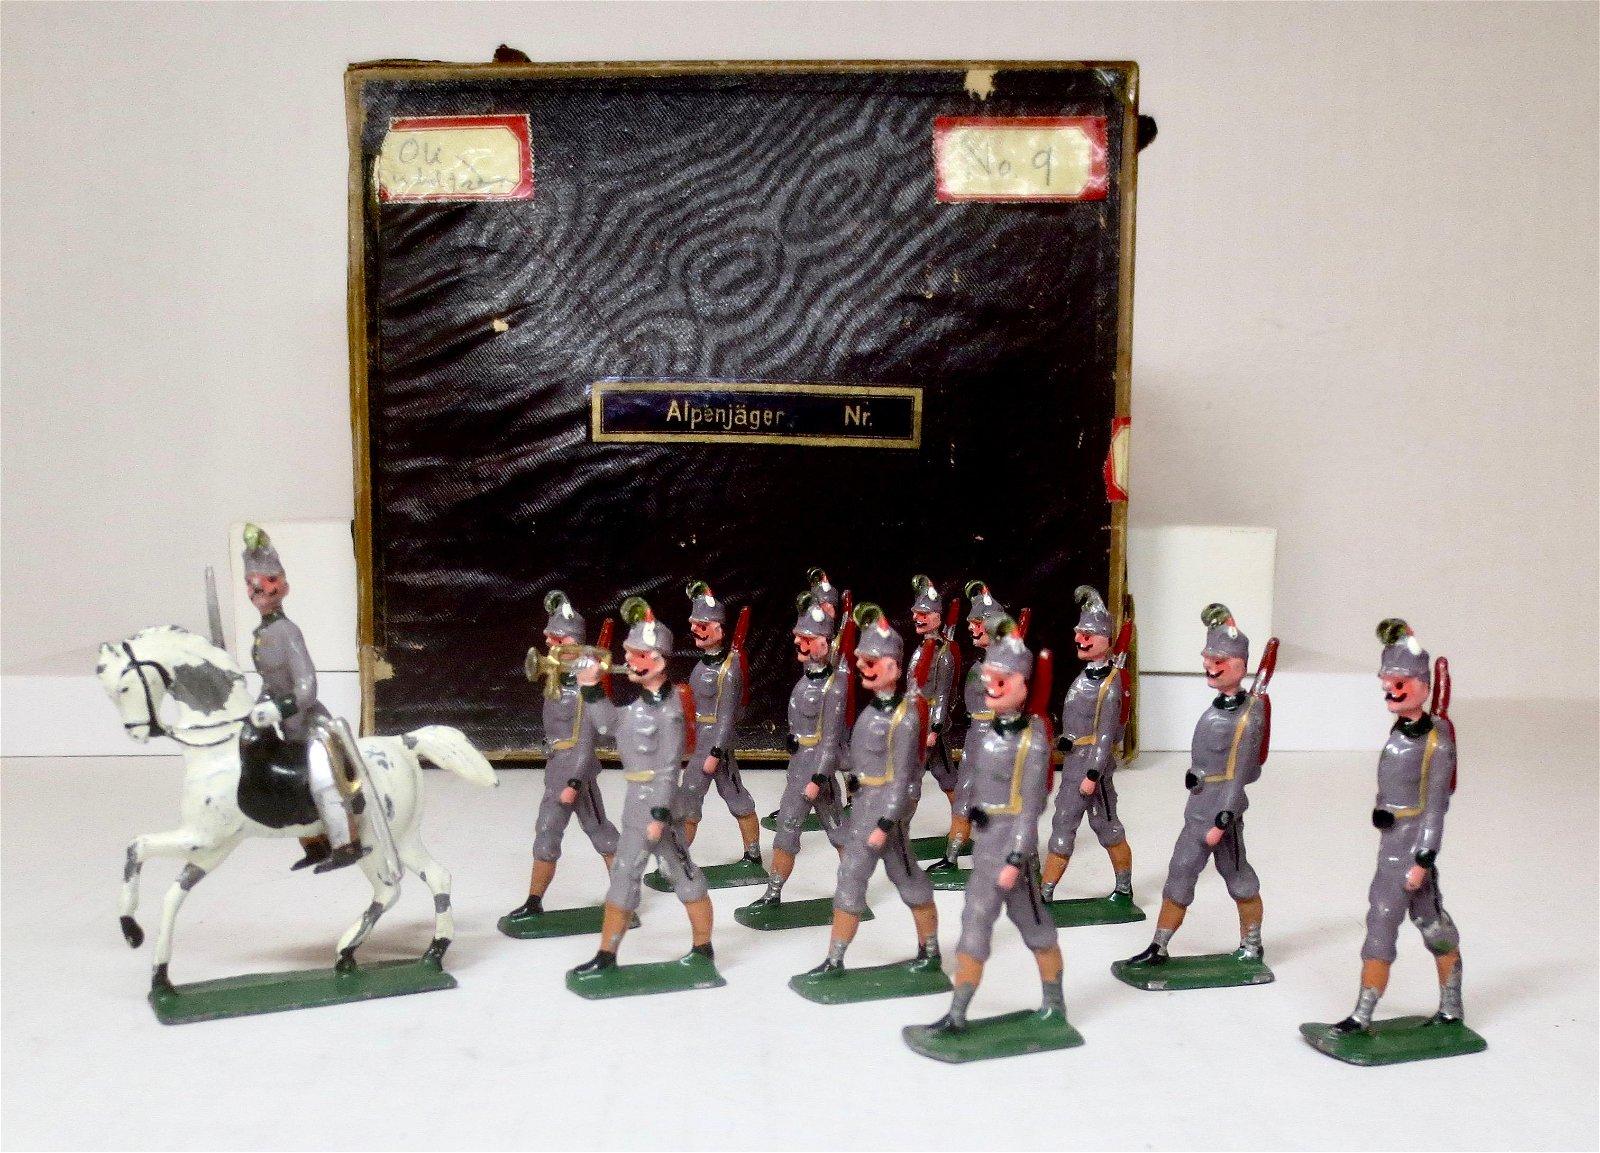 RARE Wollner or Similar Alpenjager Boxed Set